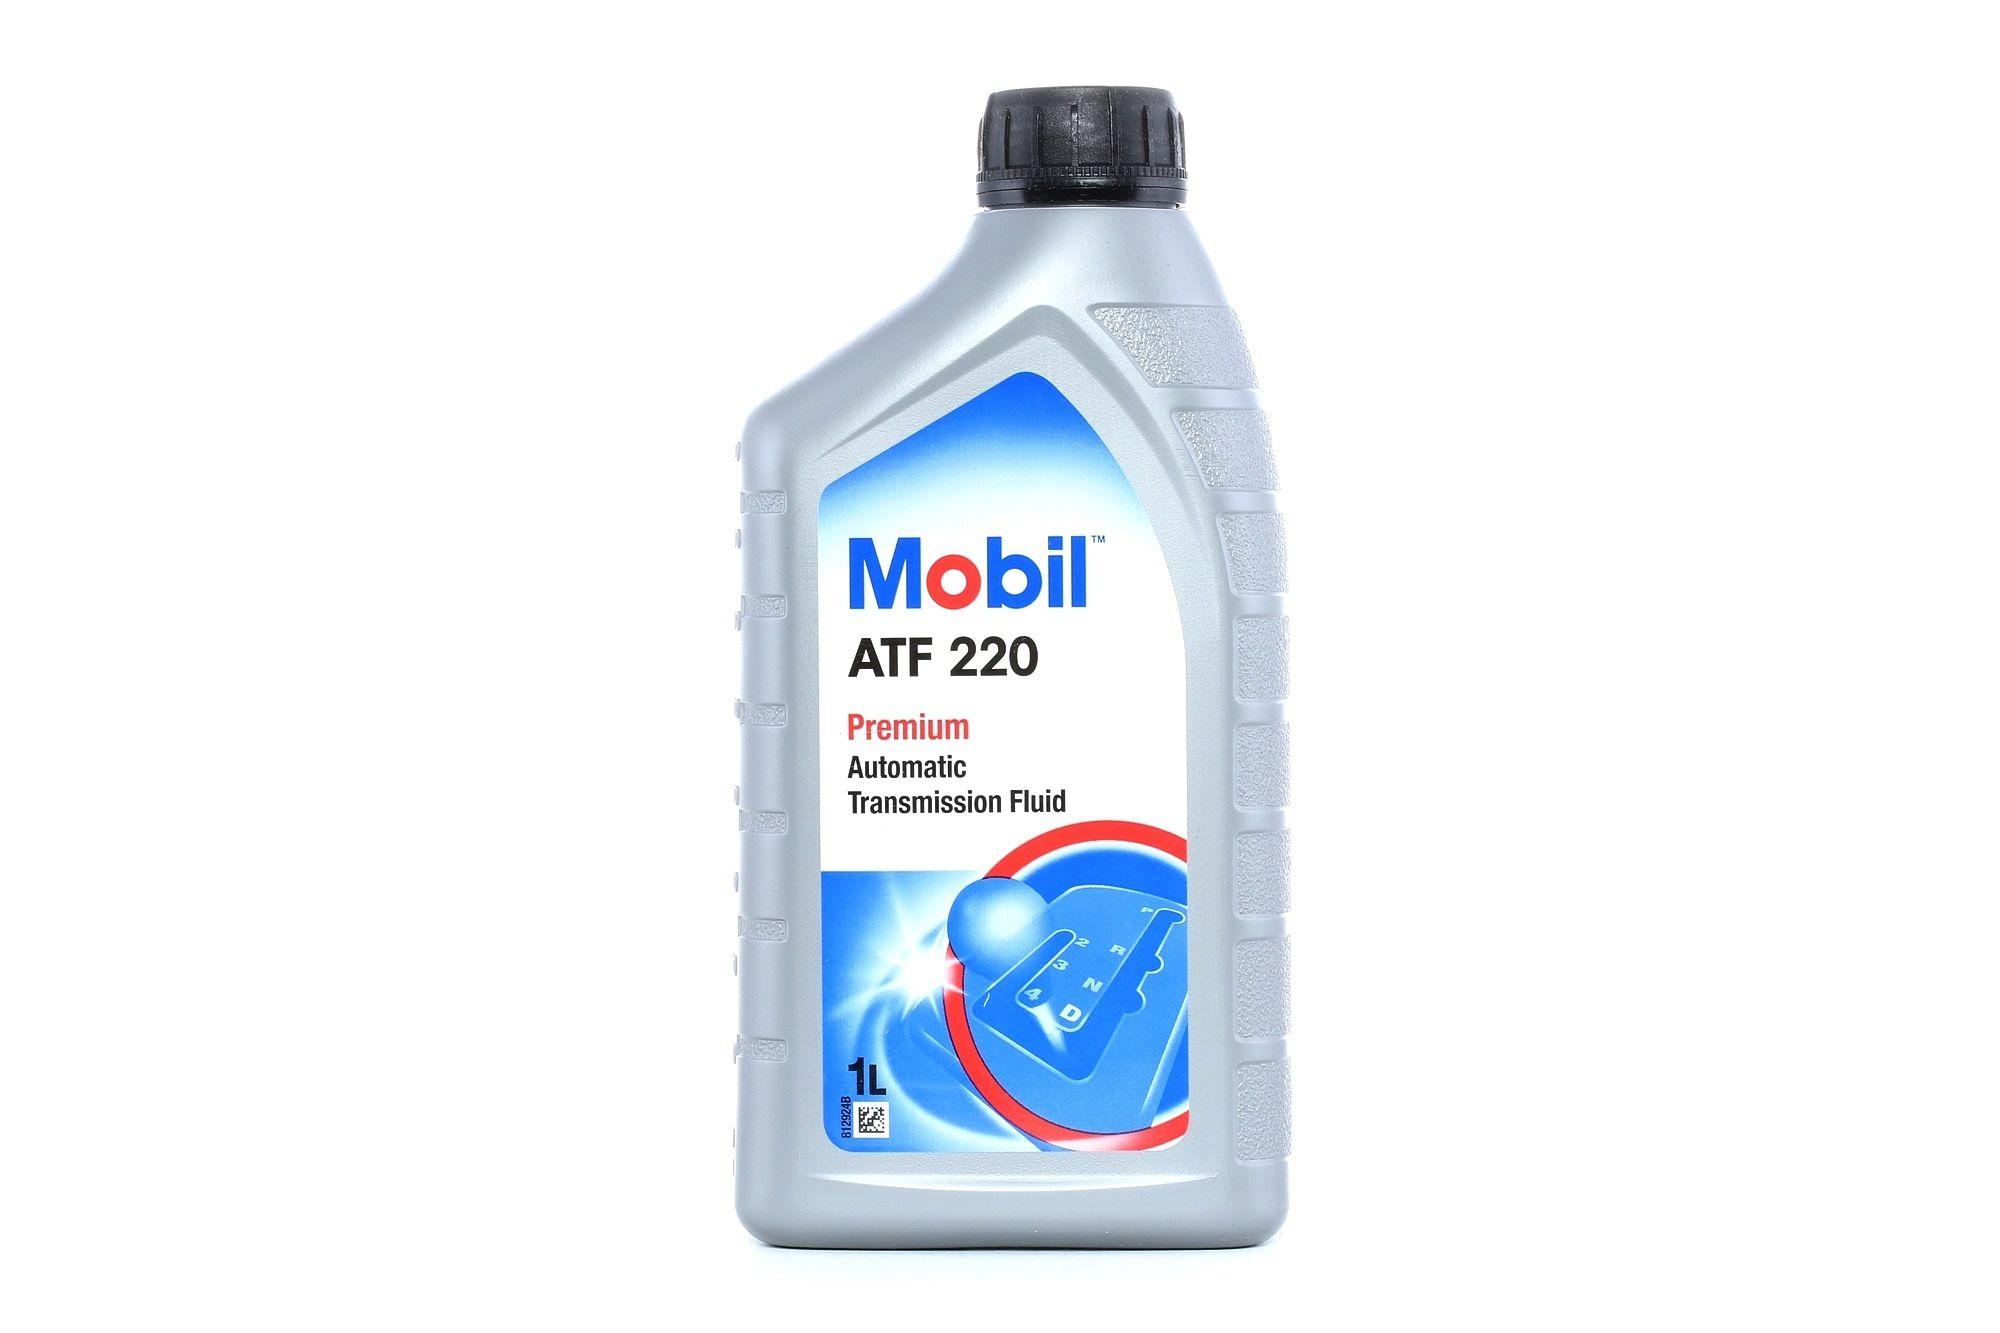 MOBIL: Original Kardanwellen & Differential 142836 ()